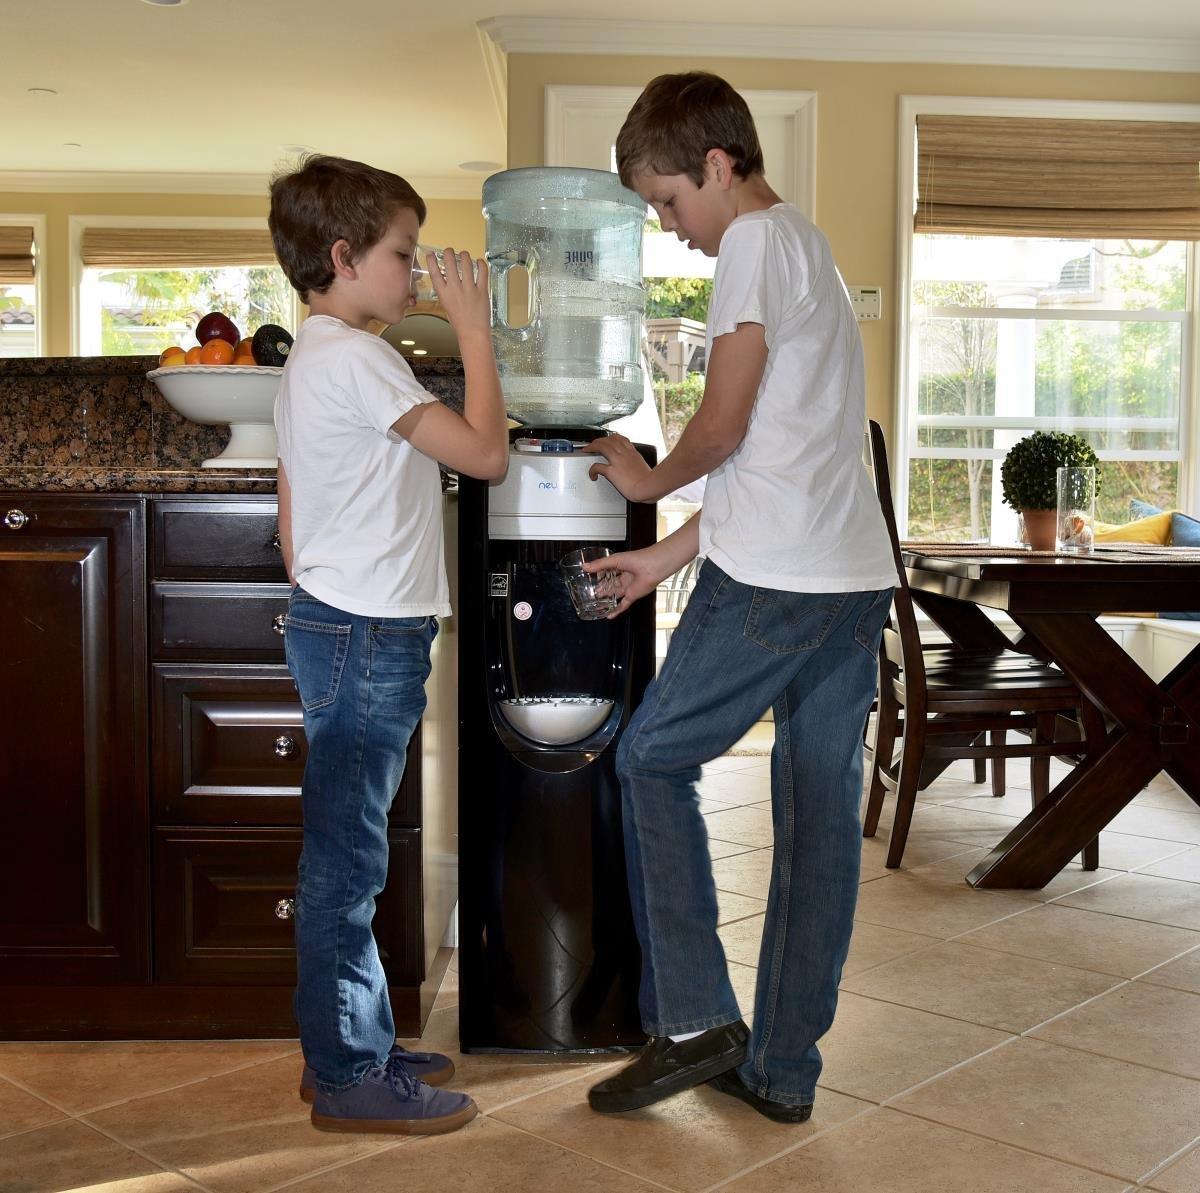 NewAir WAT30B Pure Spring BPA Free Hot and Cold Water Dispenser